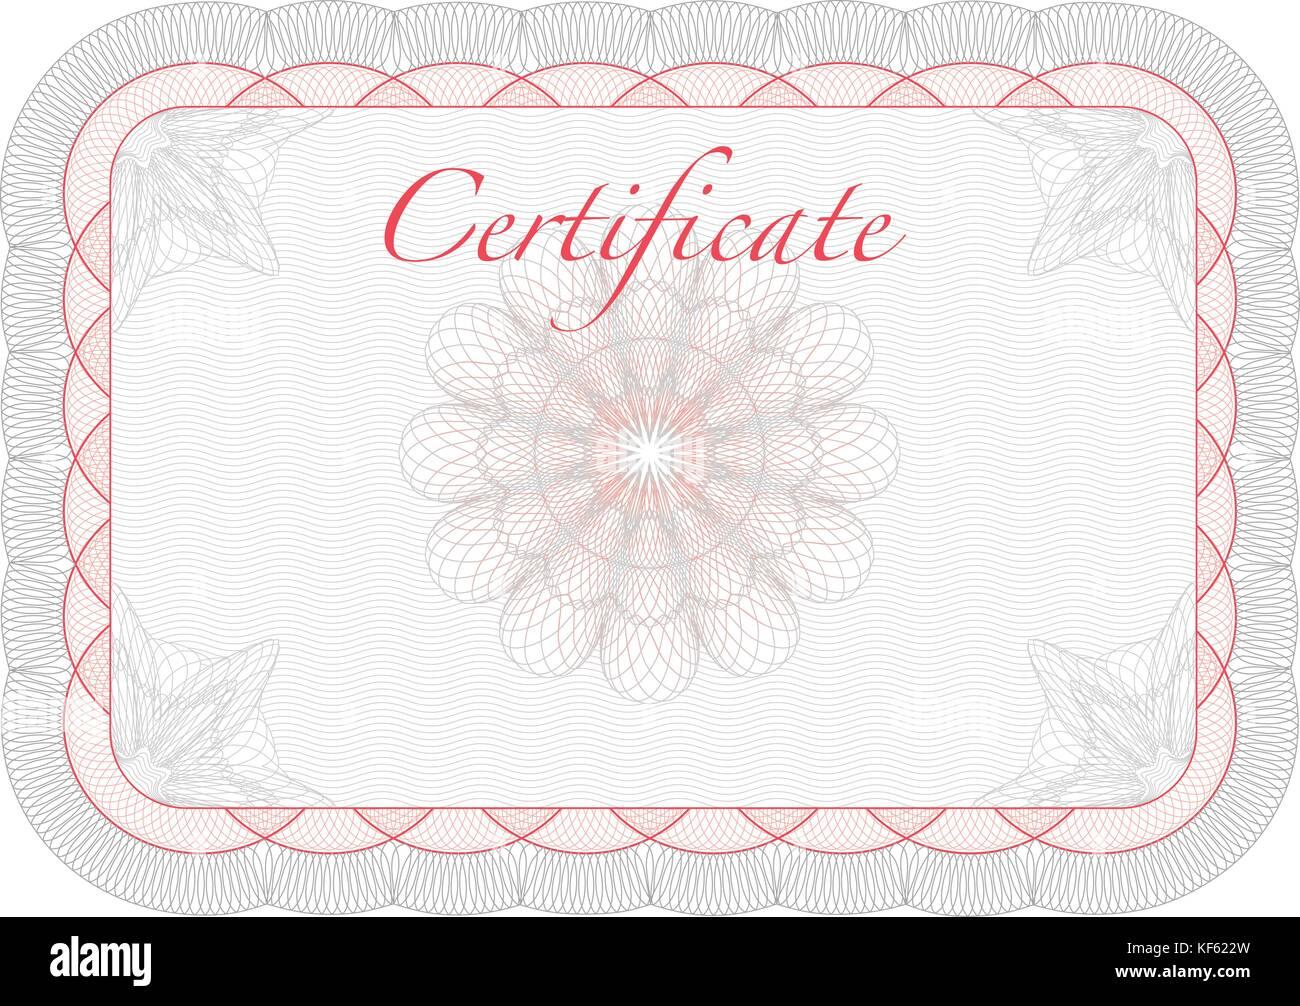 certificate border photos  u0026 certificate border images